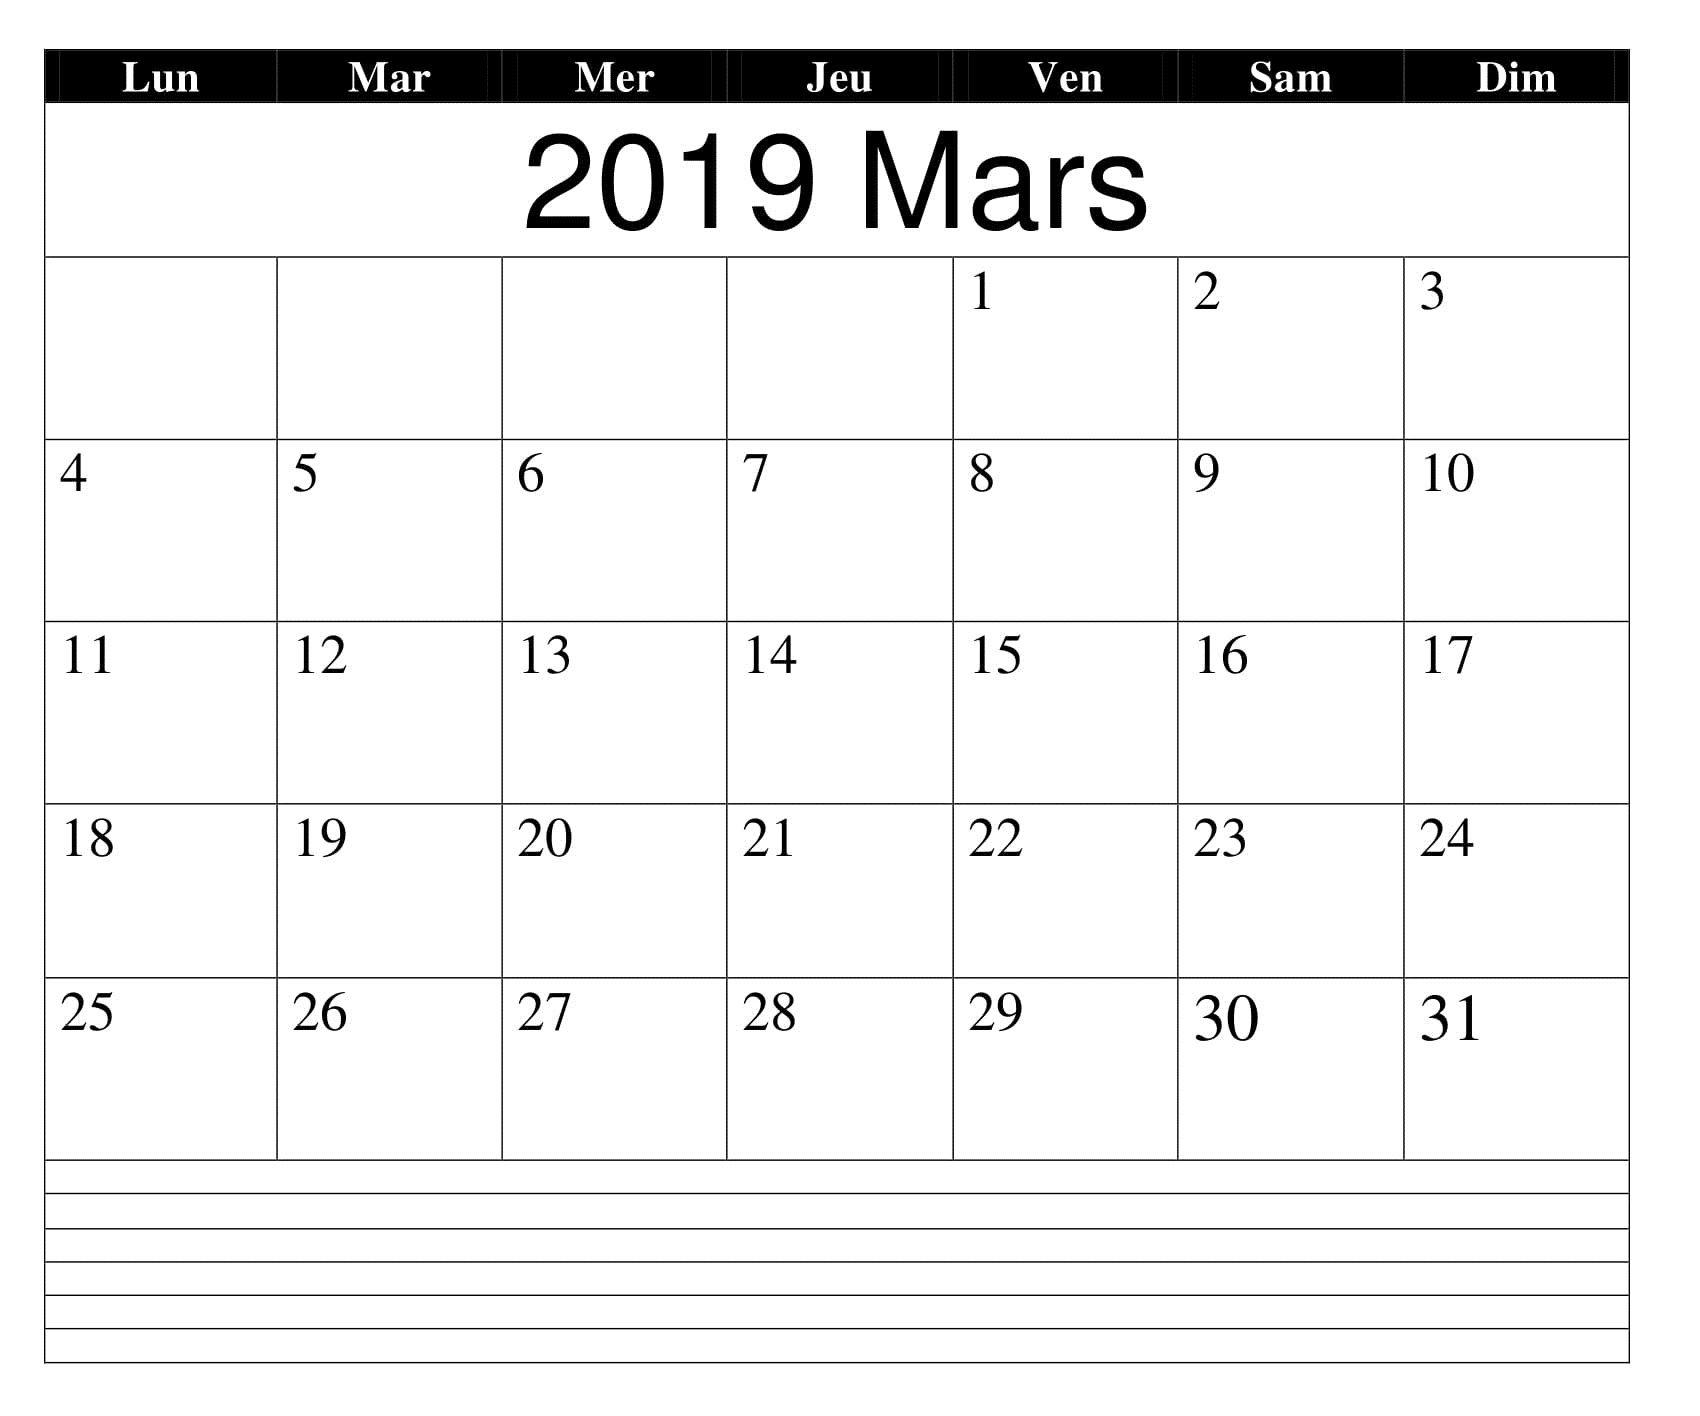 Calendrier 2019 Xls.Mars Calendrier 2019 Words Notes Mars